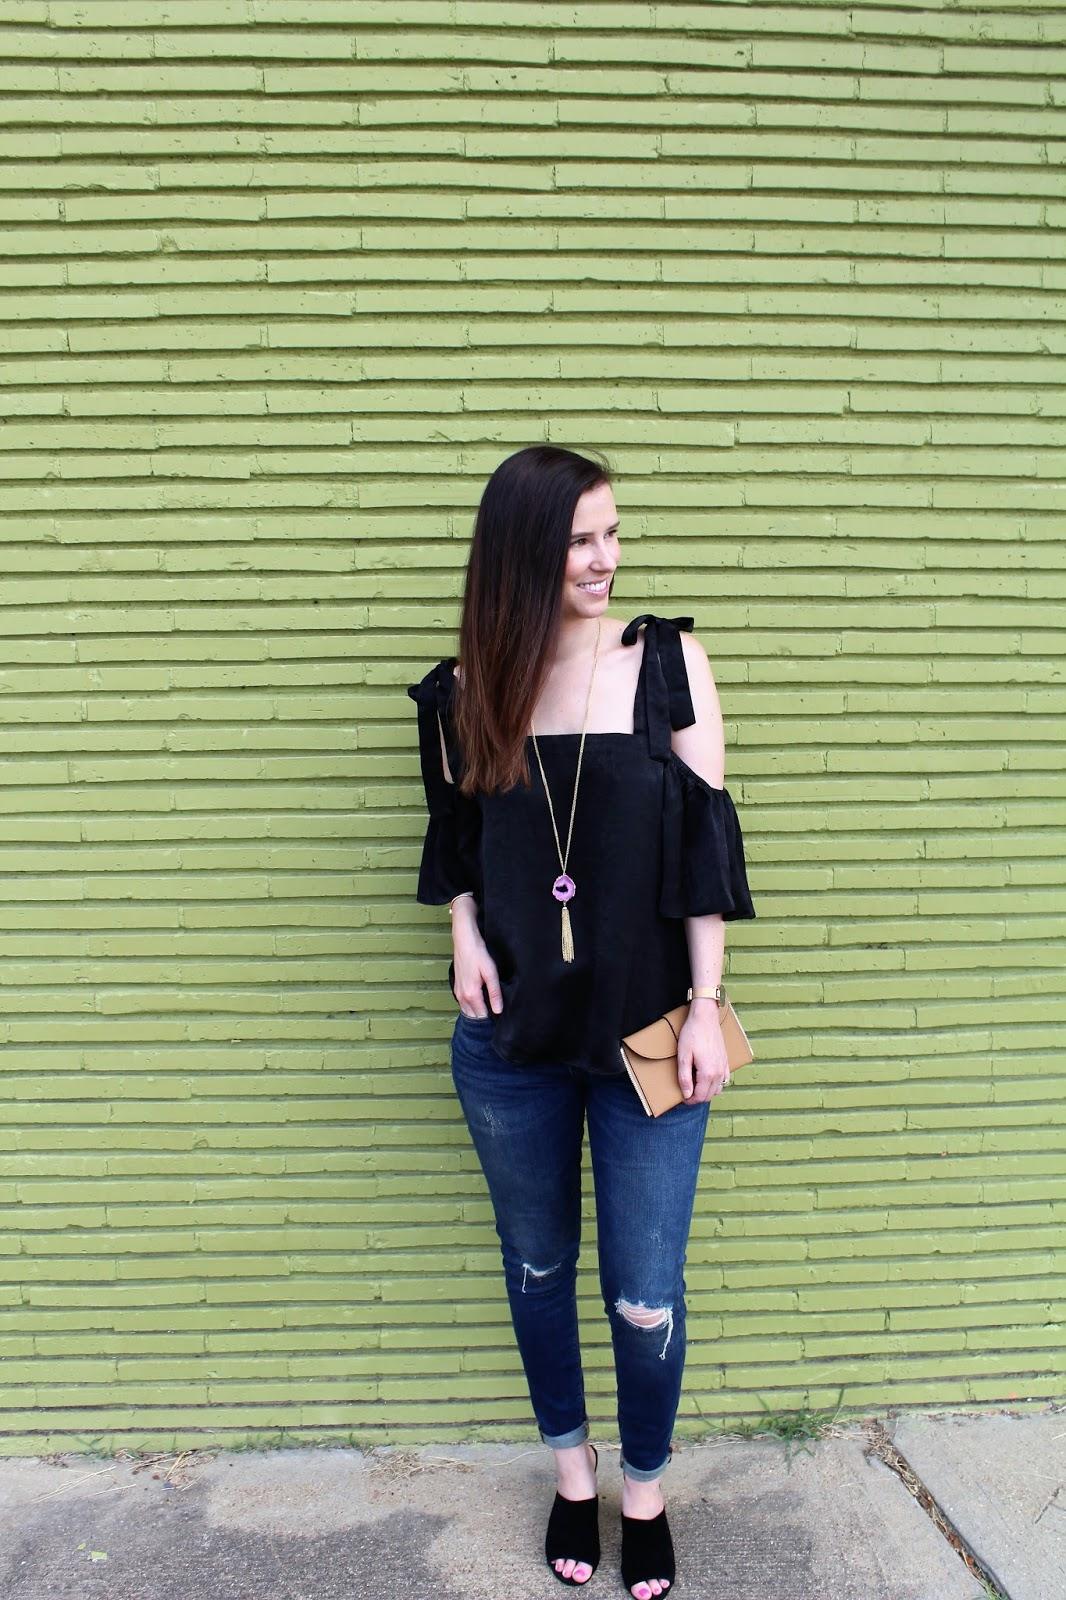 Beautifully Elegant Blog